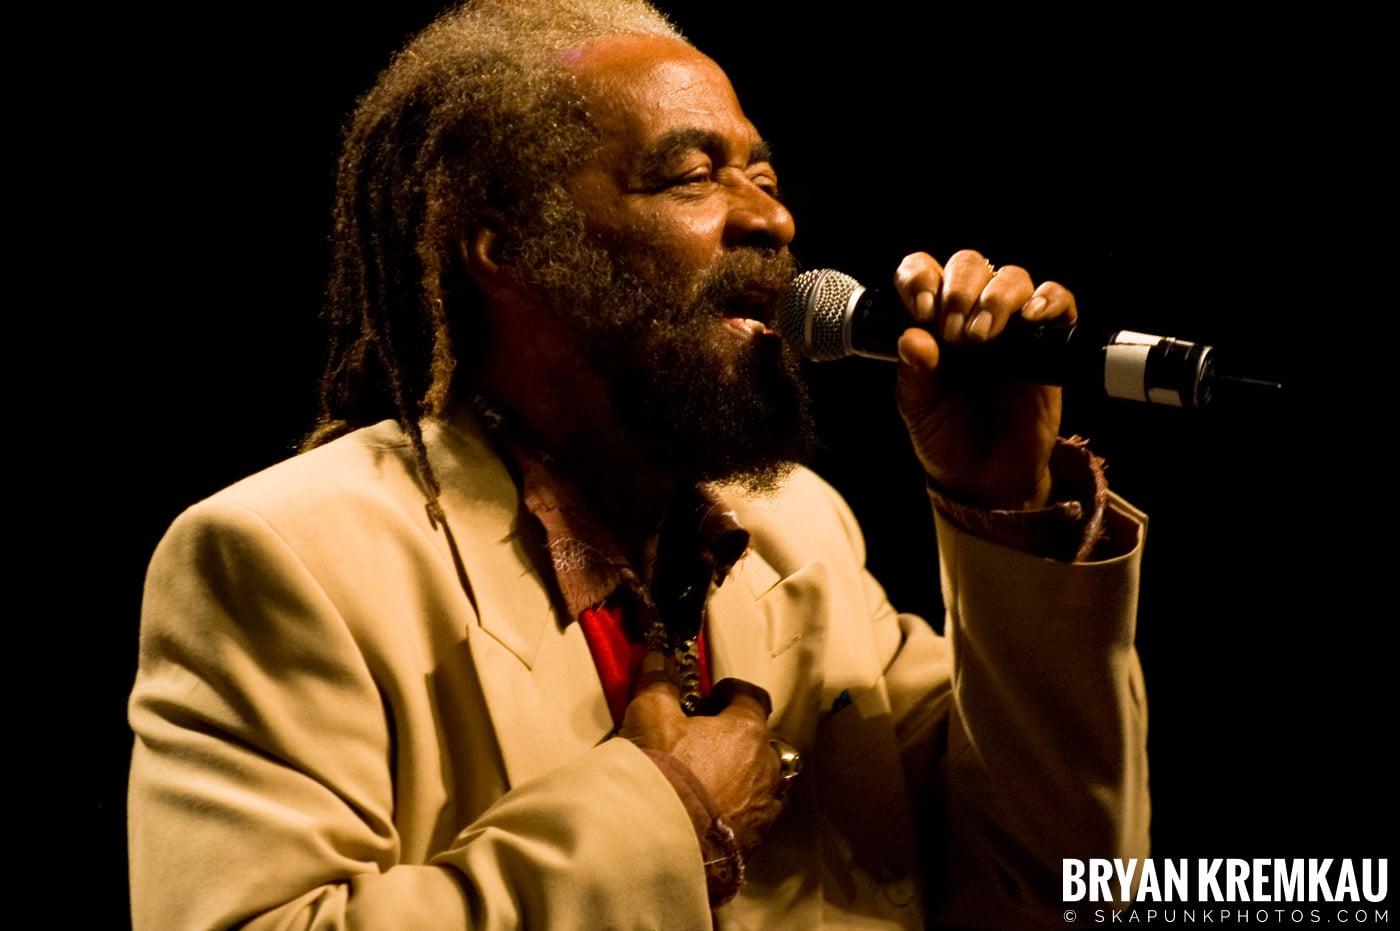 John Holt @ Vintage Reggae Fest - Hammerstein Ballroom, NYC - 12.16.07 (2)